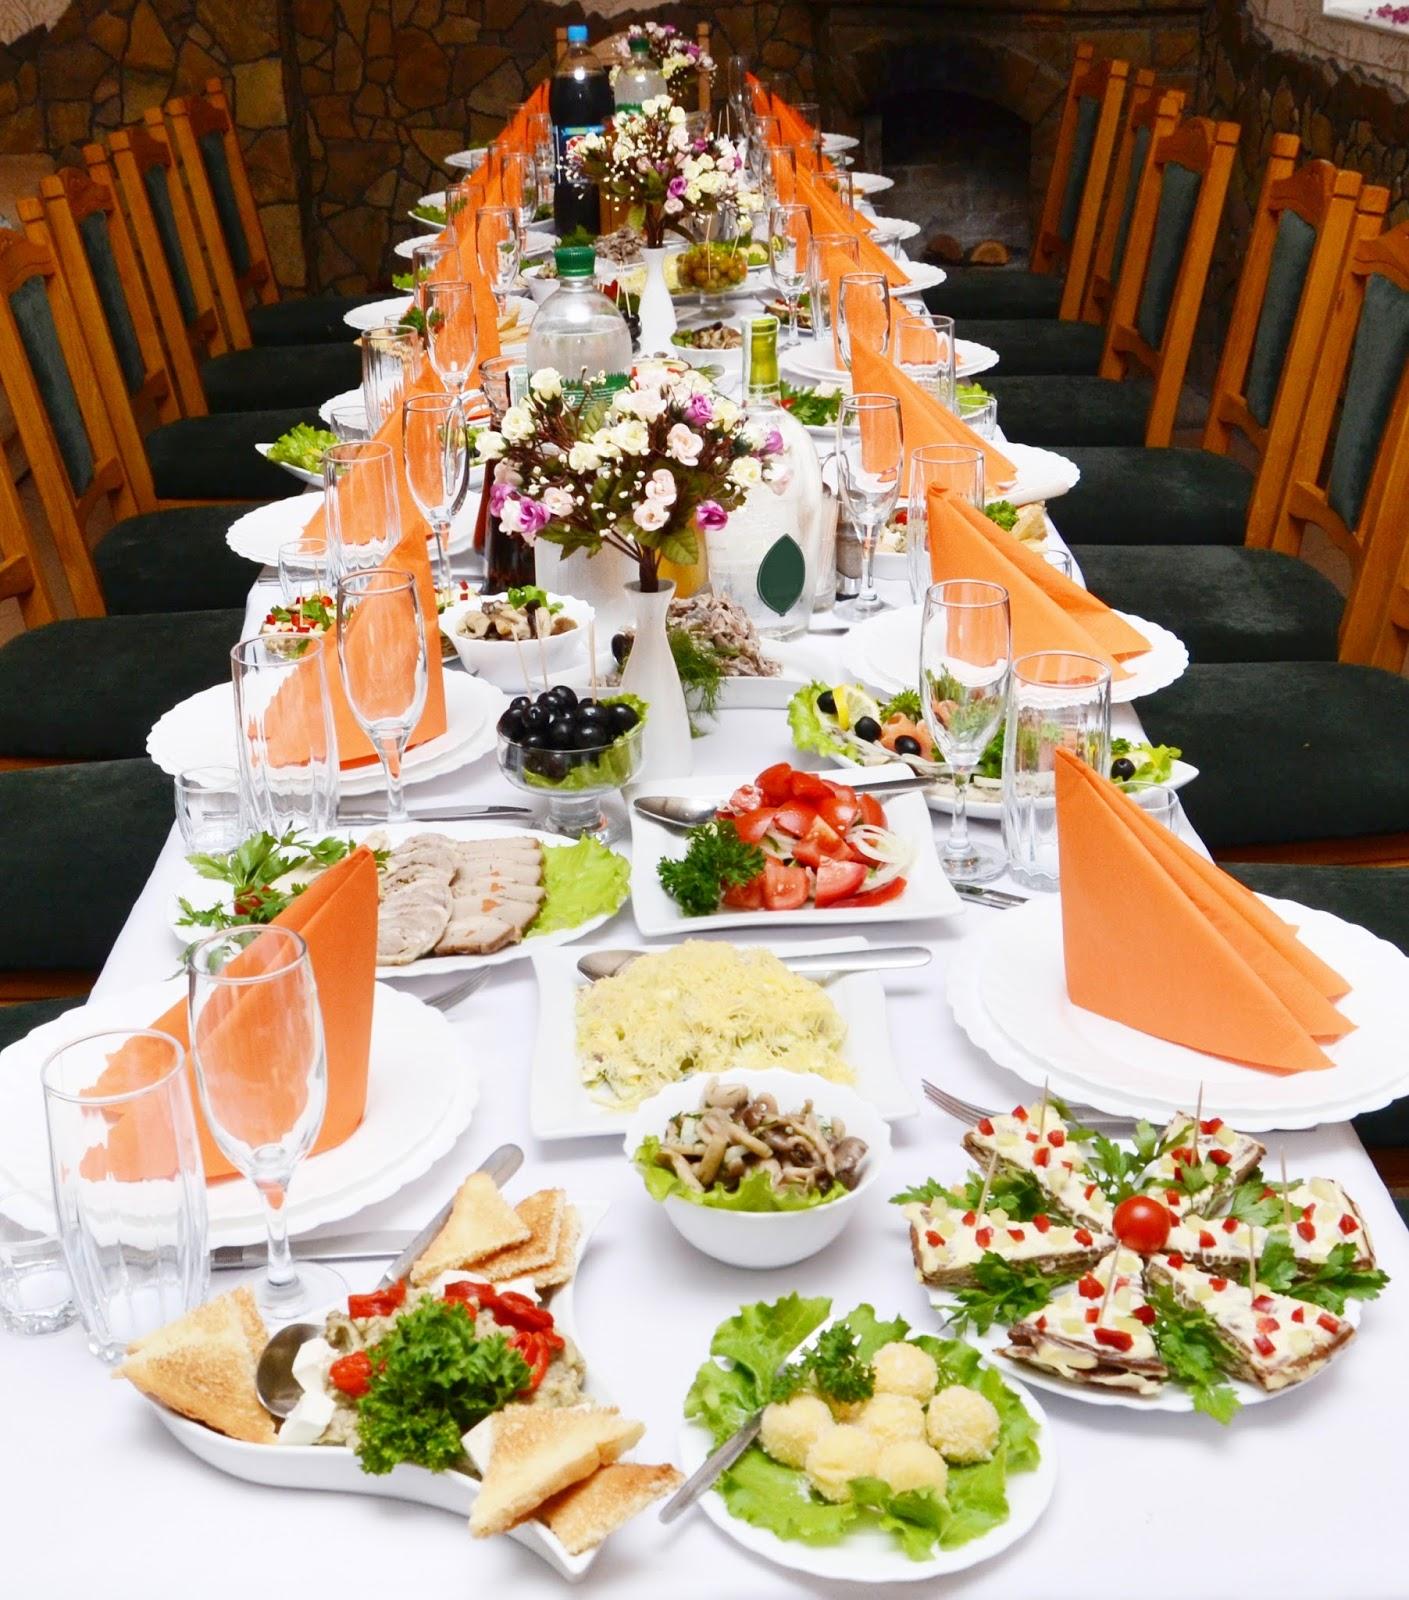 T nia rubim en espa ol vamos a aprender decorando la mesa for Decoracion de comida